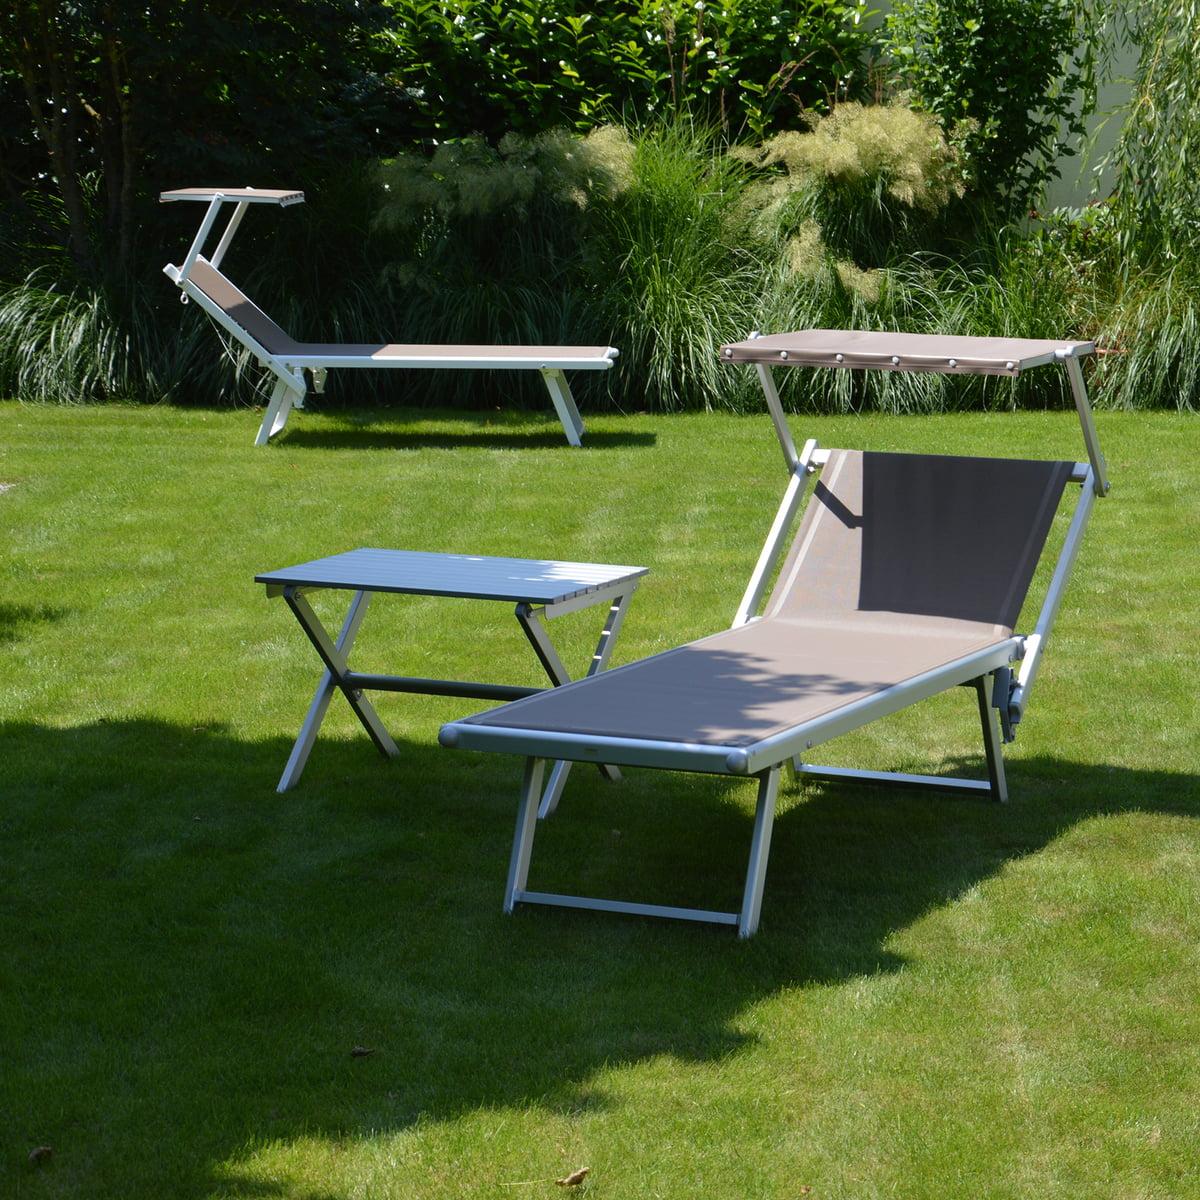 rimini classic deck chair by jan kurtz. Black Bedroom Furniture Sets. Home Design Ideas